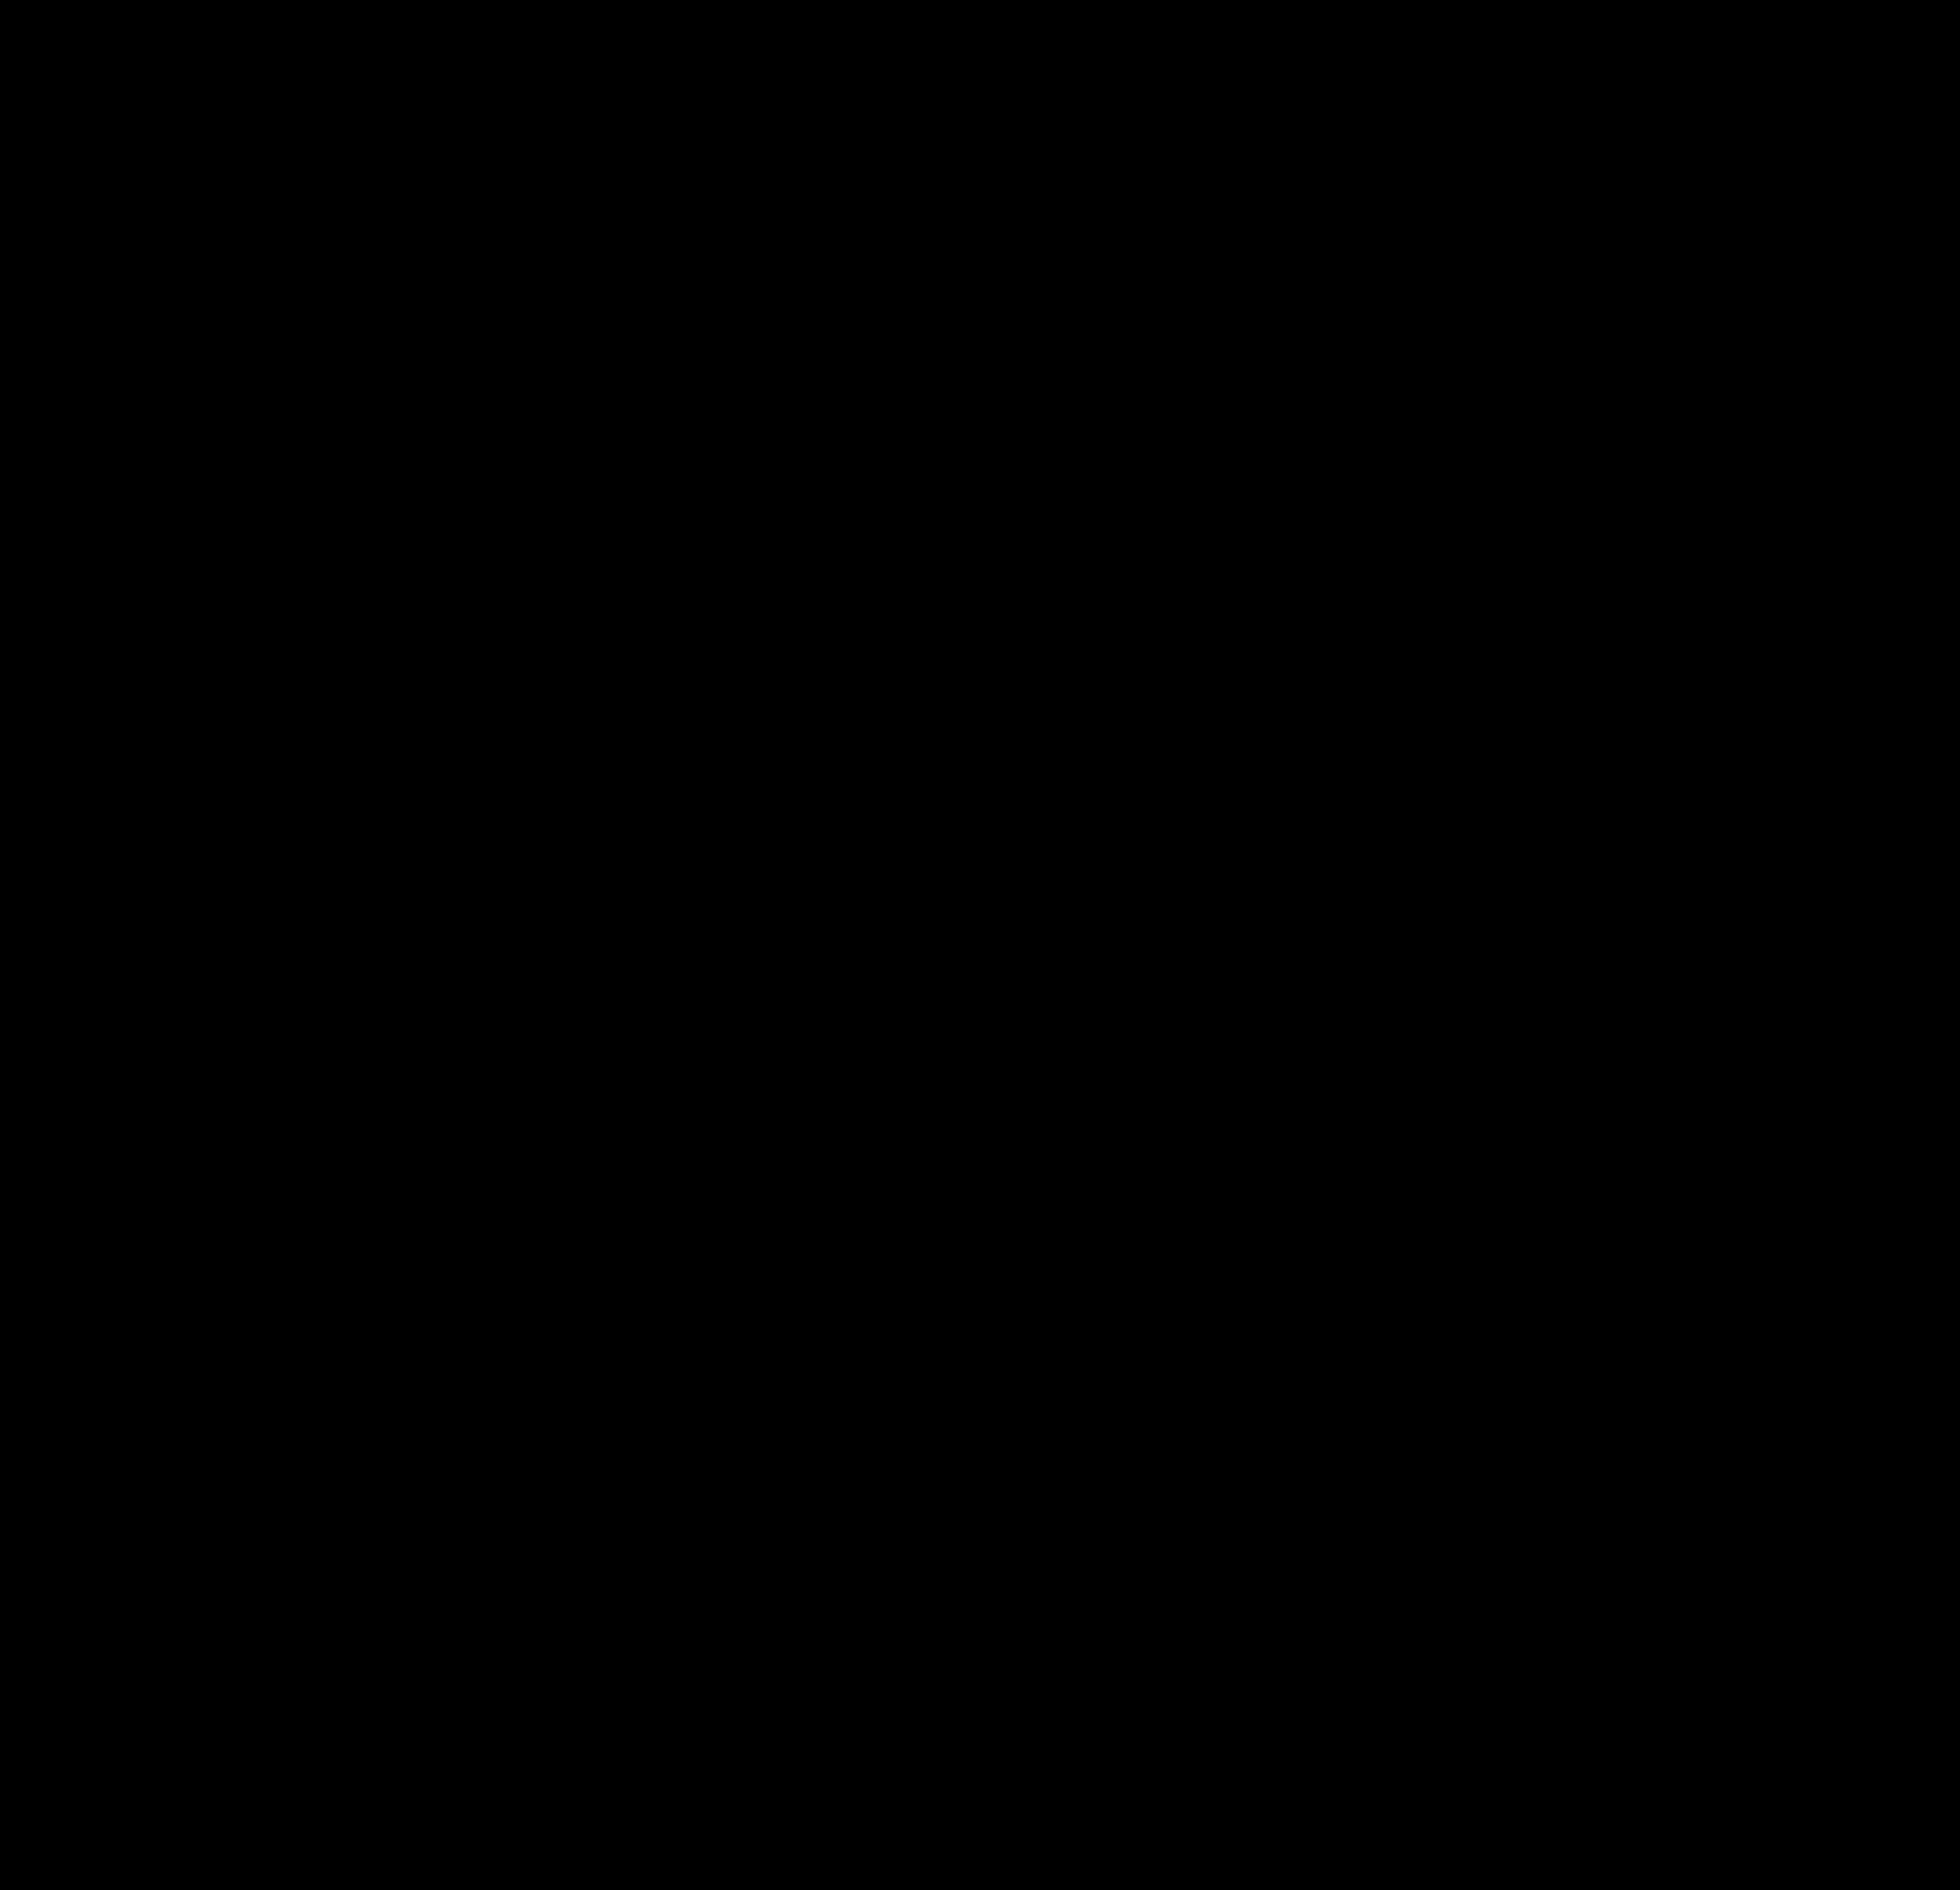 logo-black (12).png